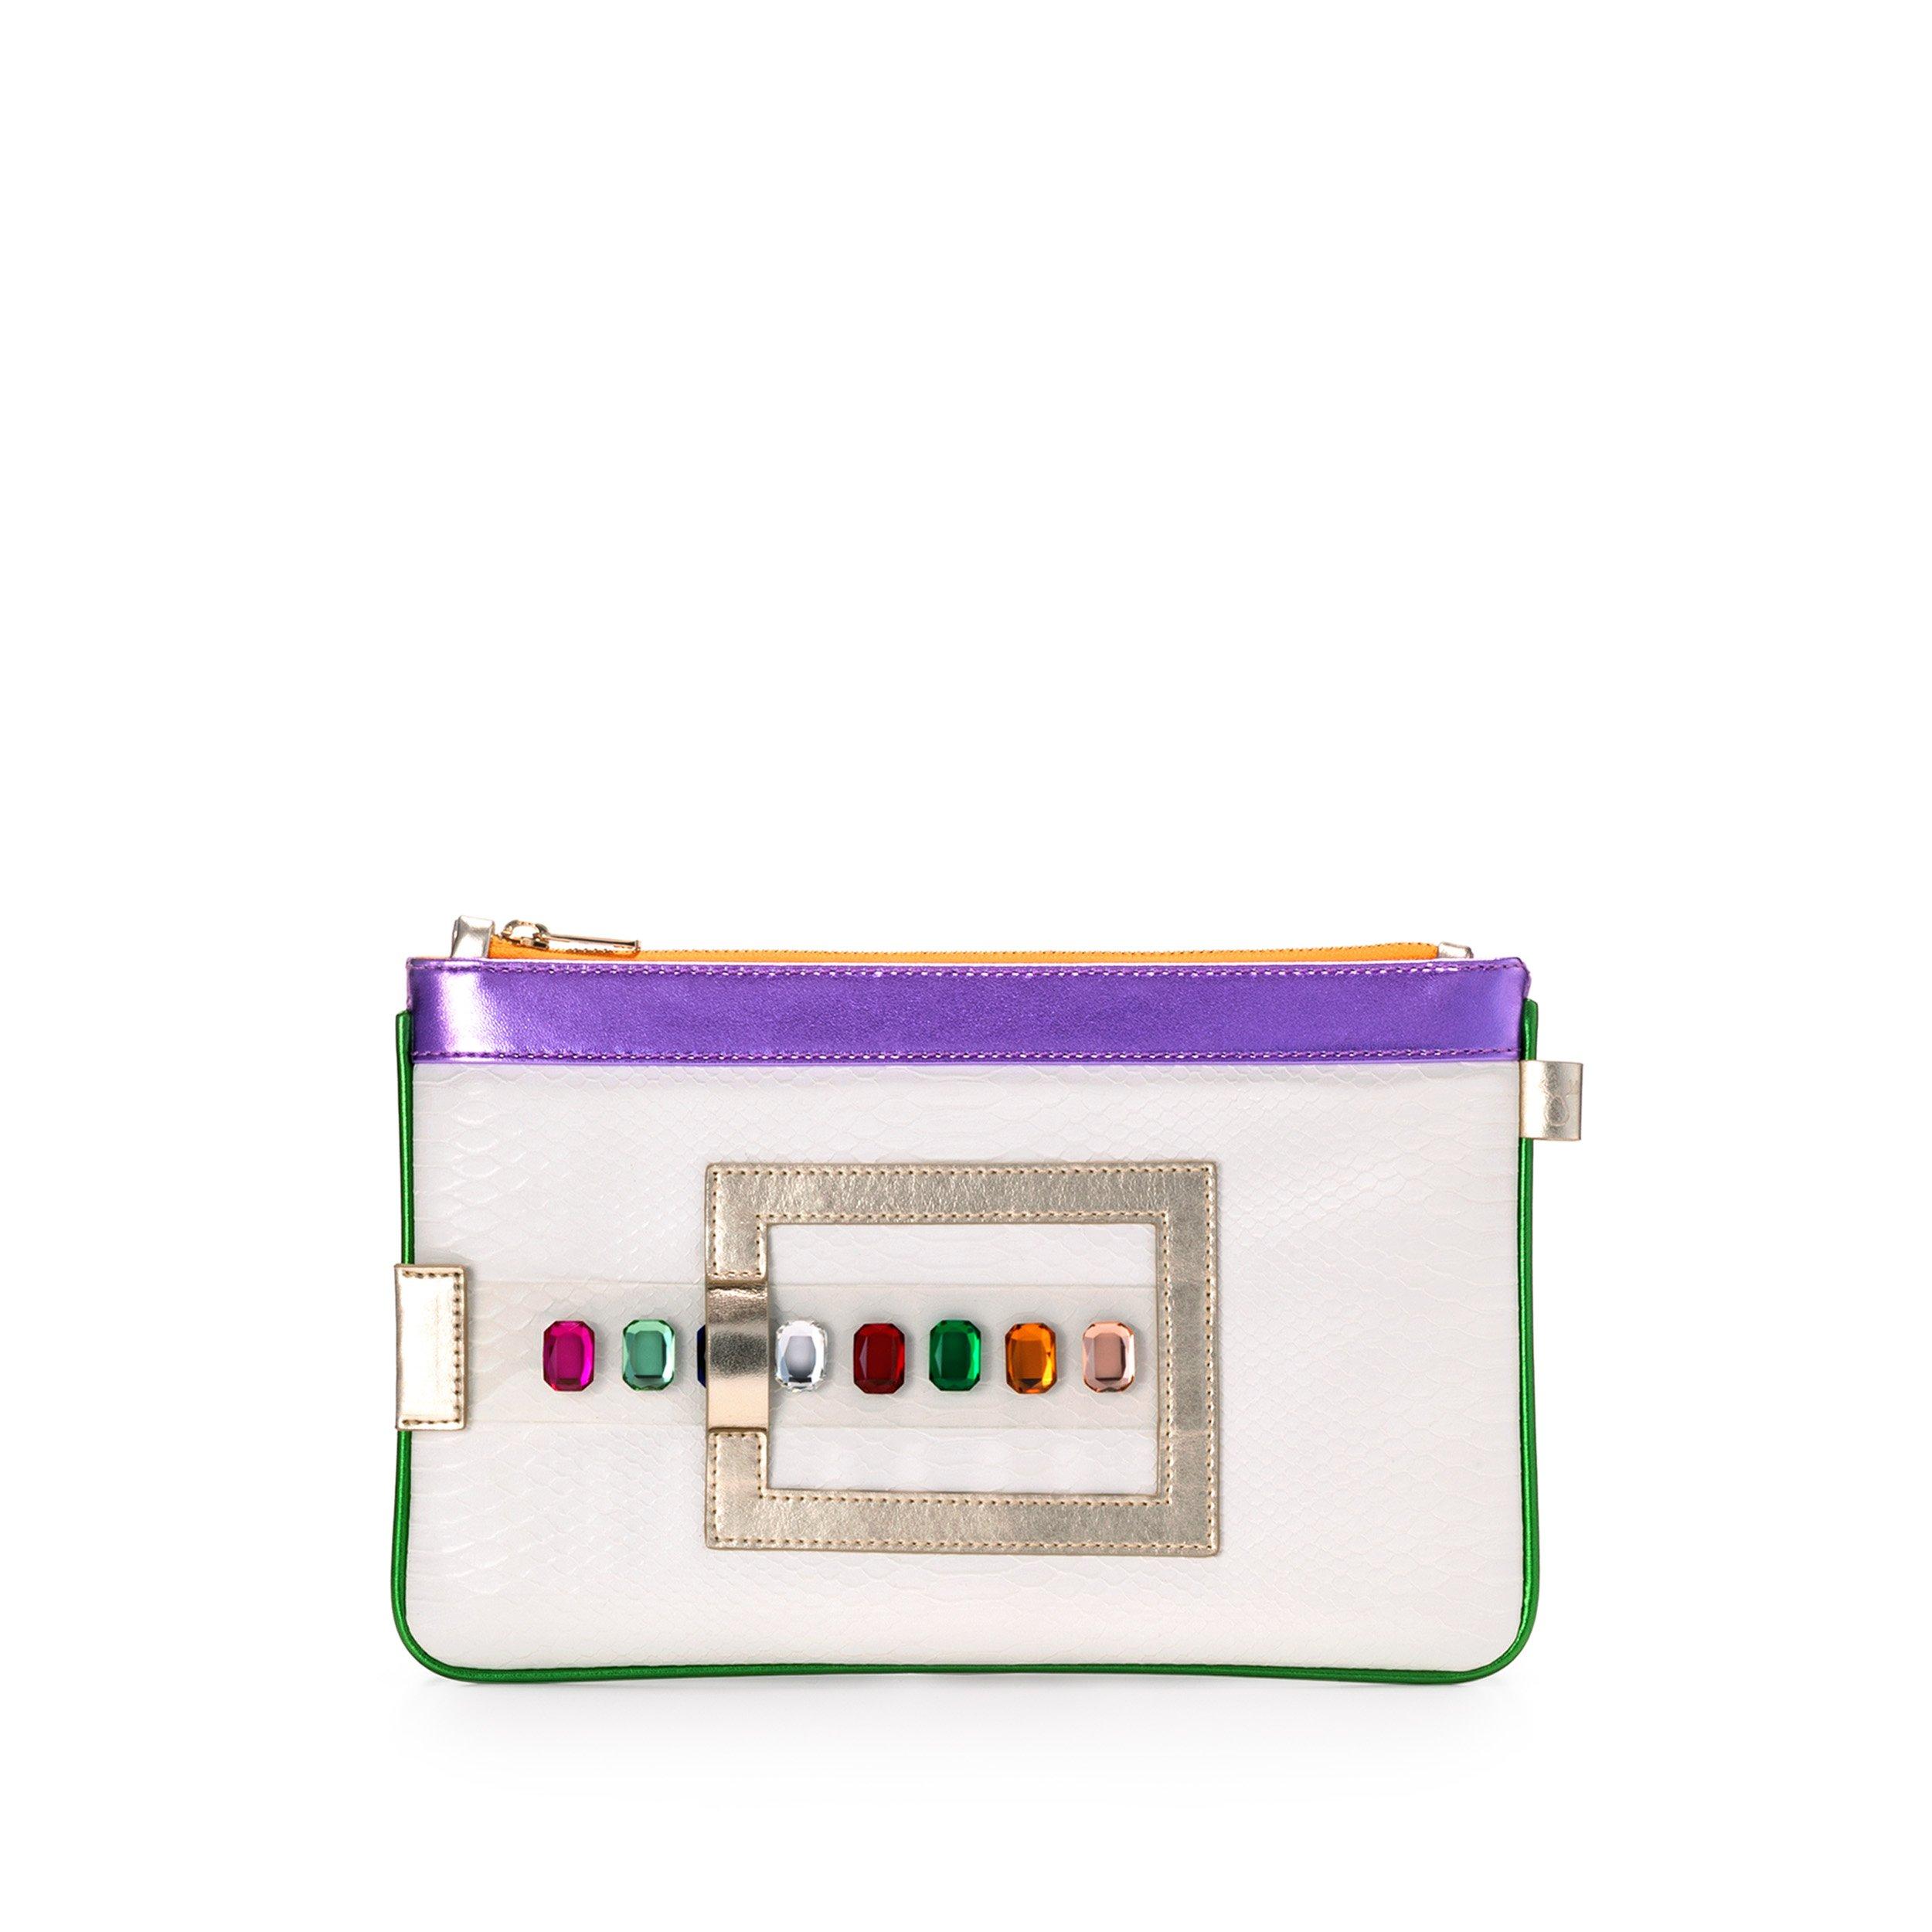 GEMINI Luxury Vegan Bag, Clutch, Purse, Wallet. Multicolored Gems